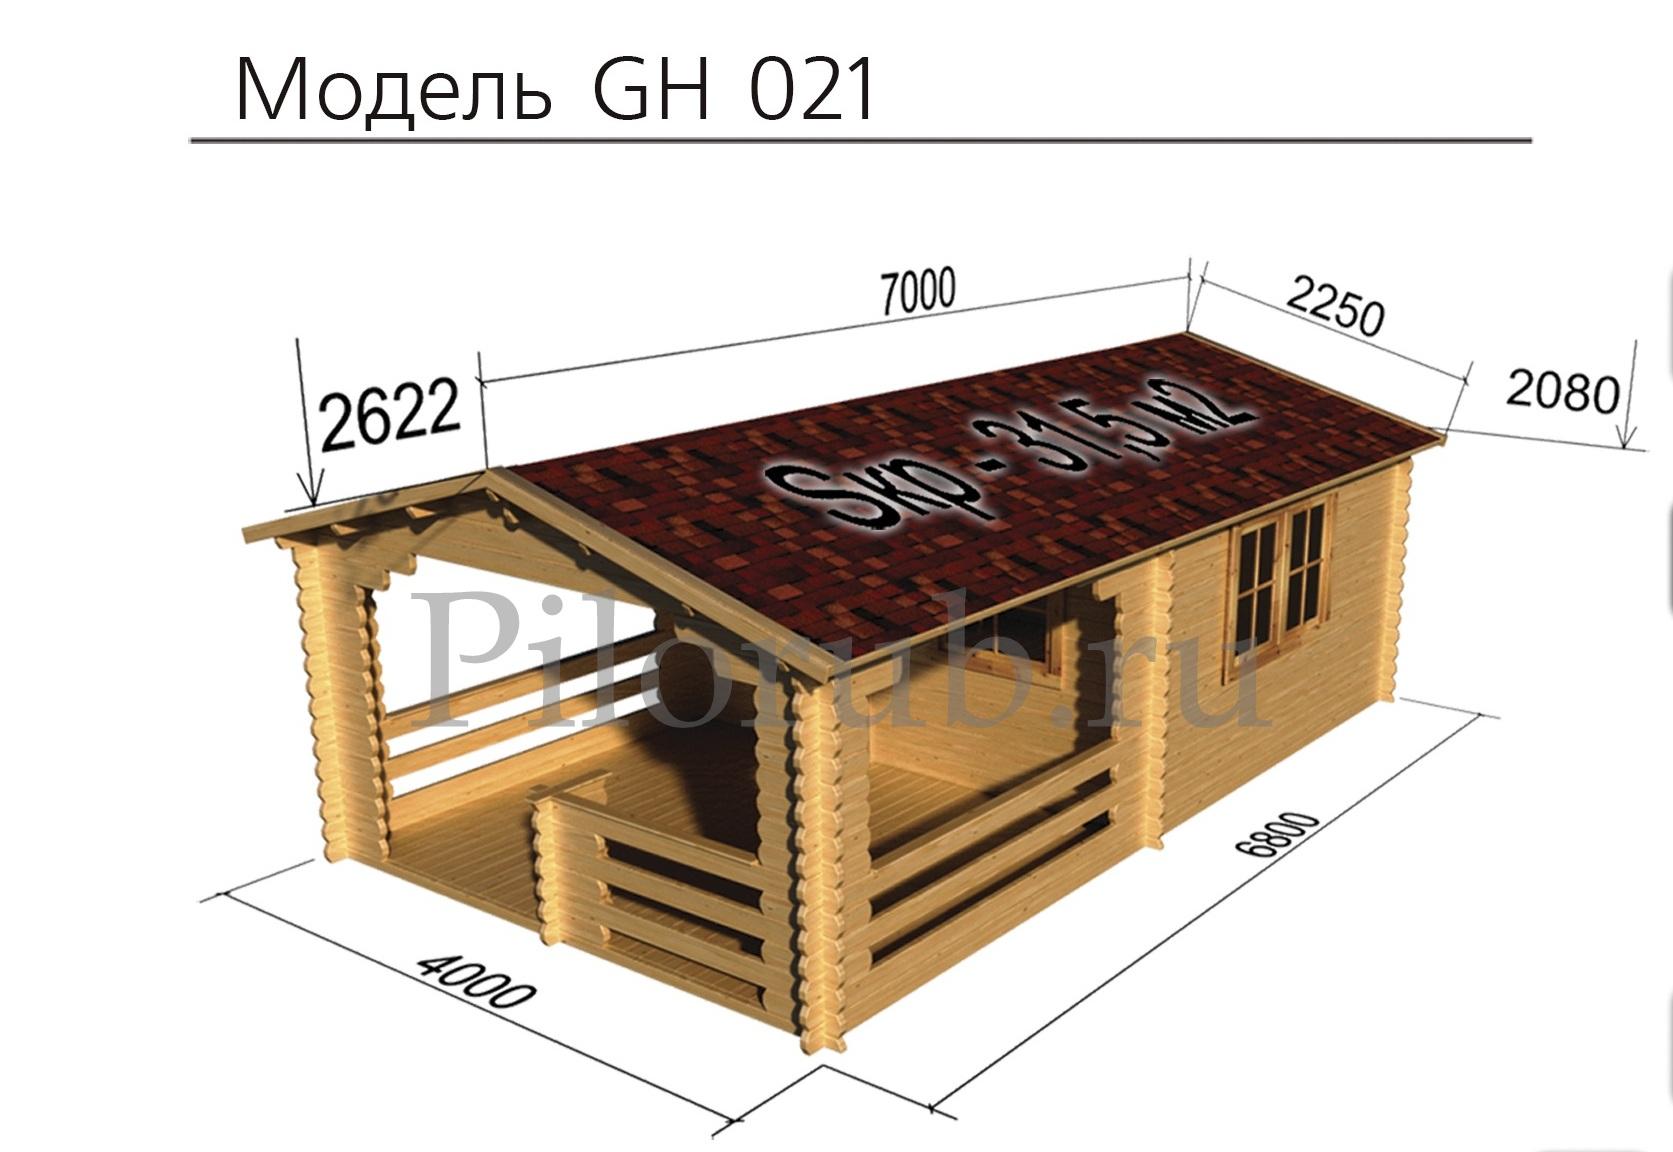 GH021